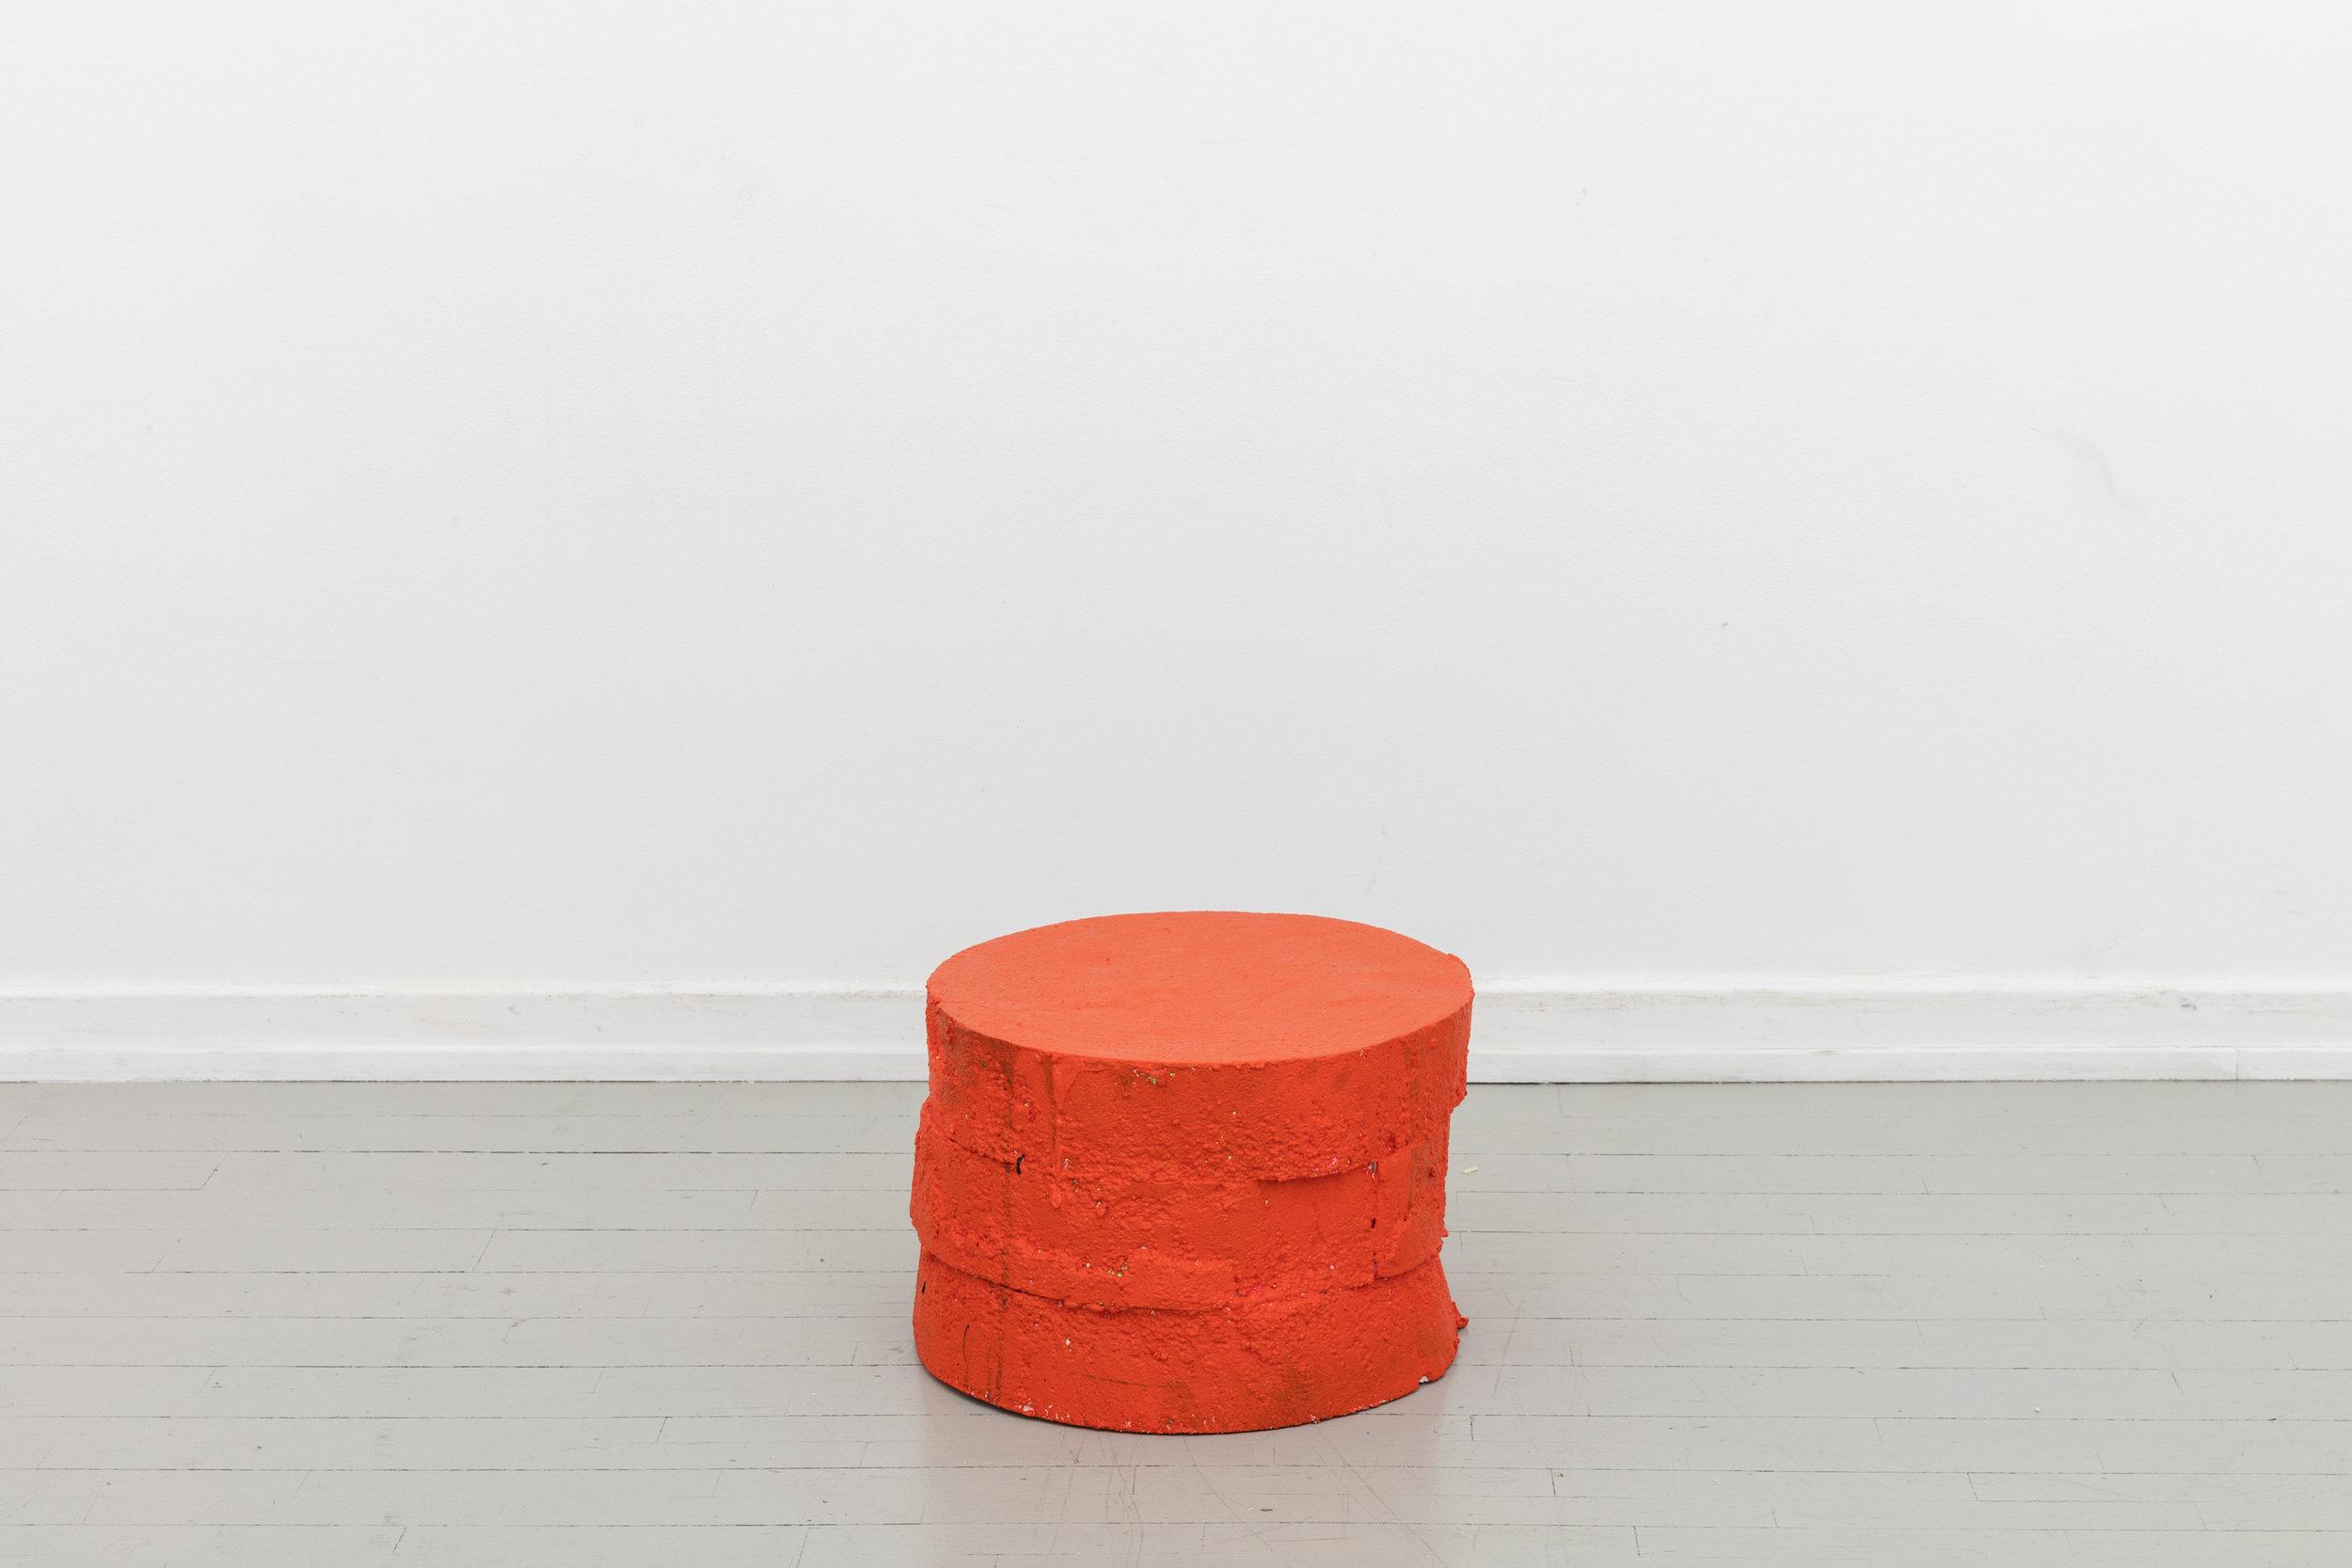 Soft Orange Table - 2017Polystyrene, paint, foam⌀ 45 cm, H: 30 cmPrice on request